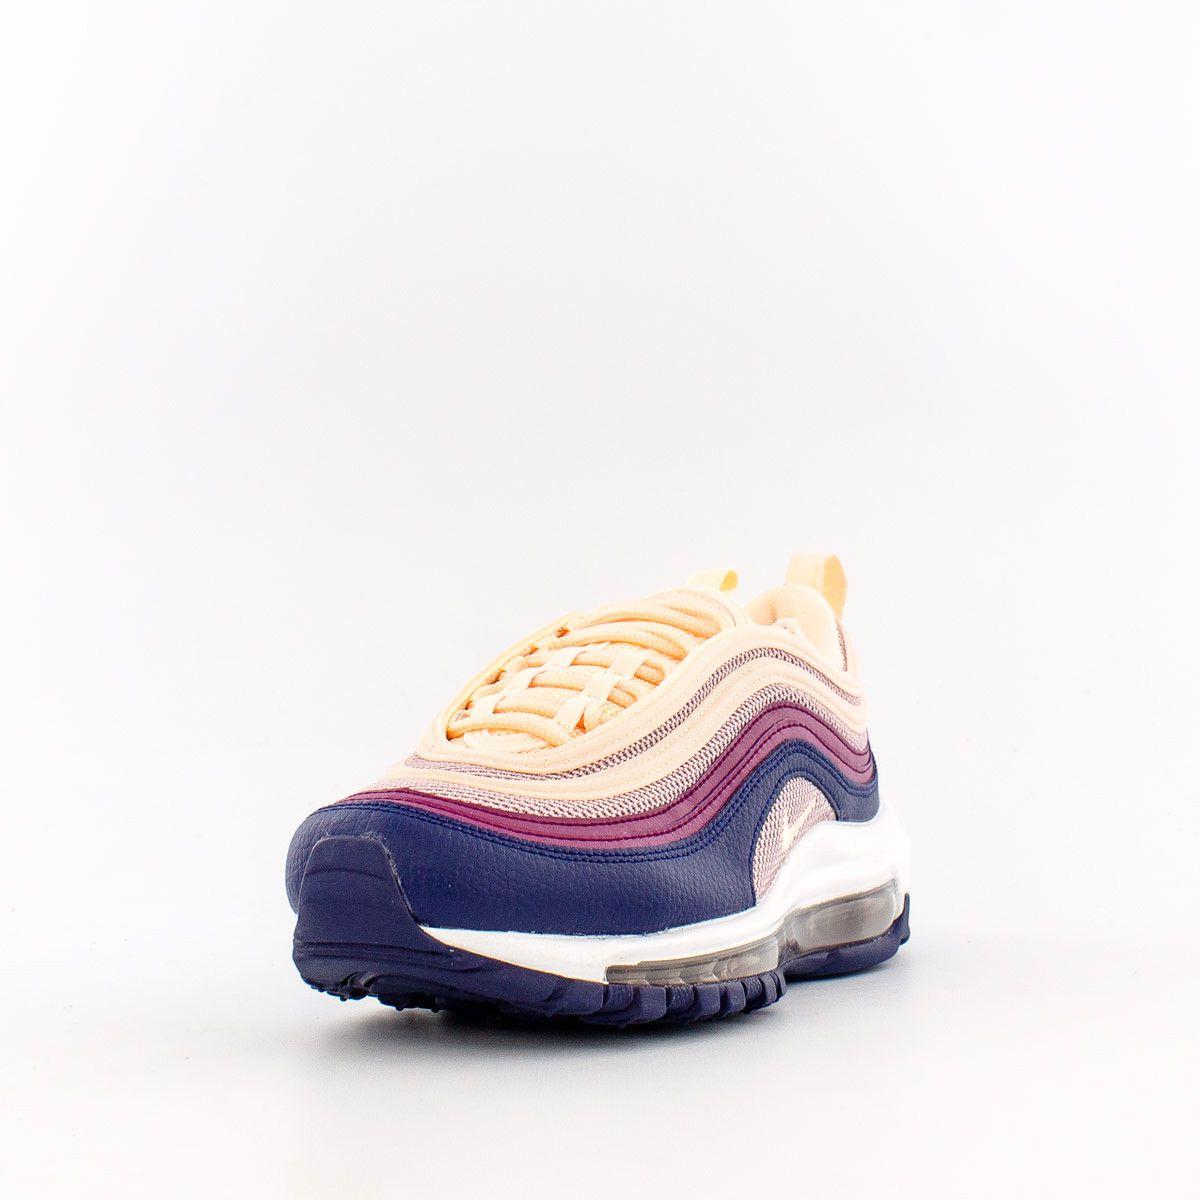 outlet store 959de 23561 Nike Air Max 97 (W) - Crimson Tint - 921733-802 - YCMC.com